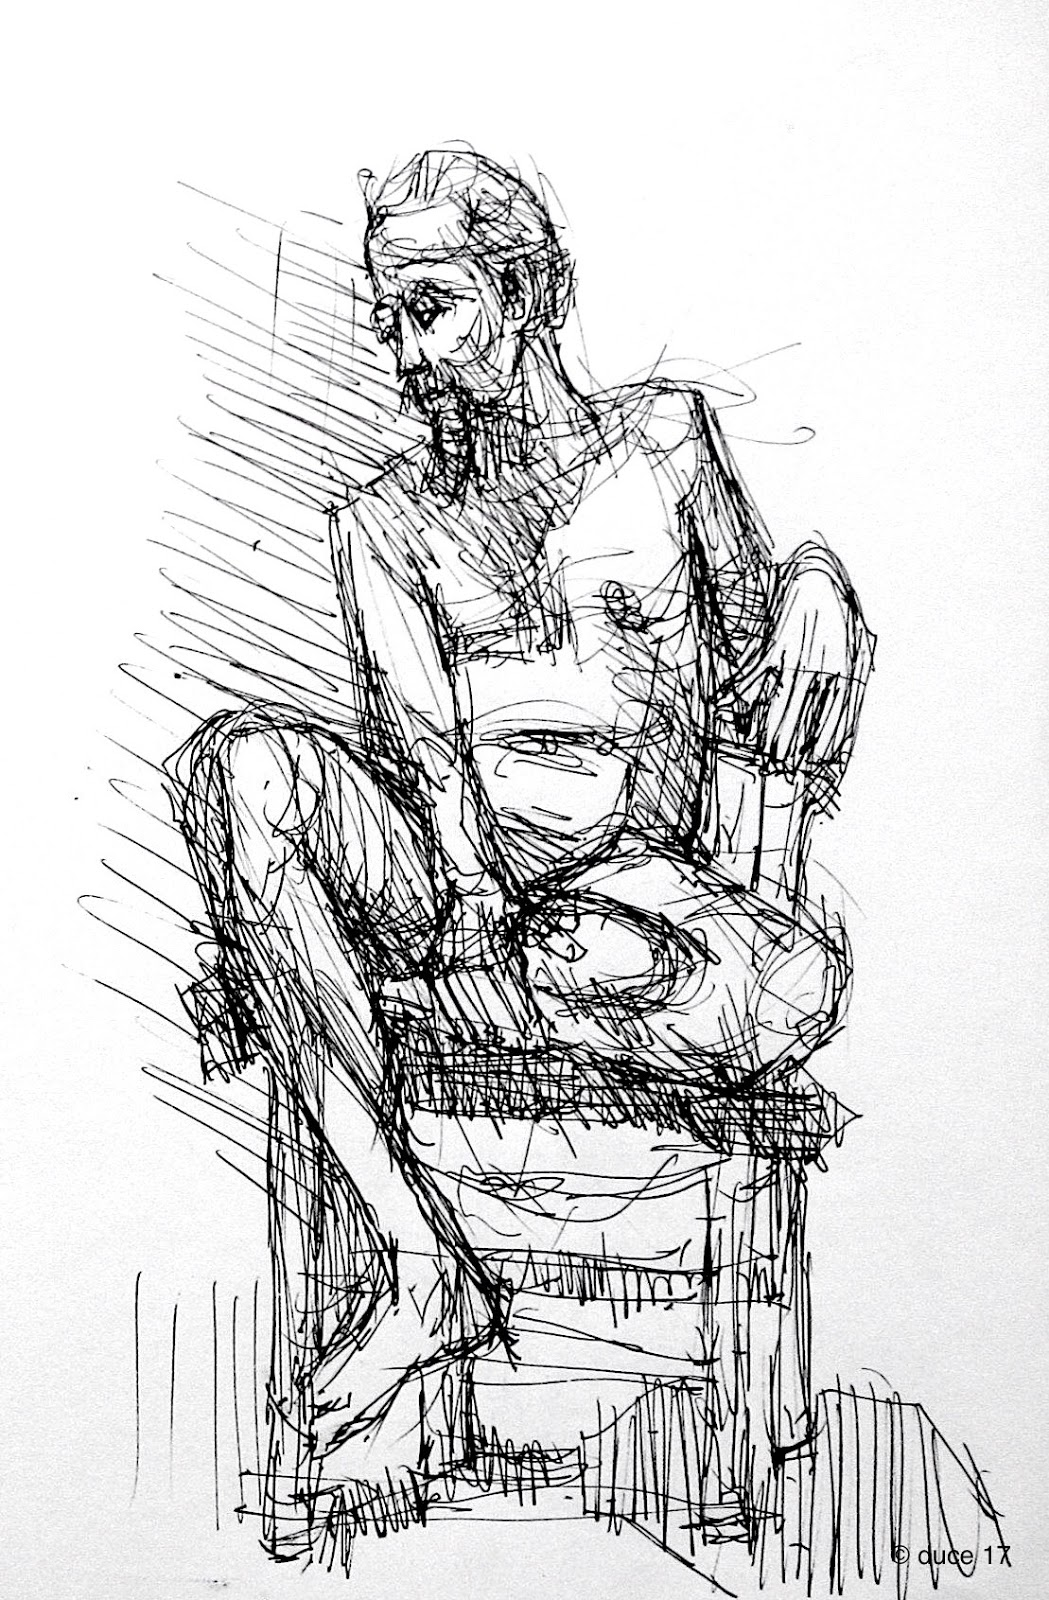 Duce: Drawings, Paintings, Words: Absorbing Silent Verdicts